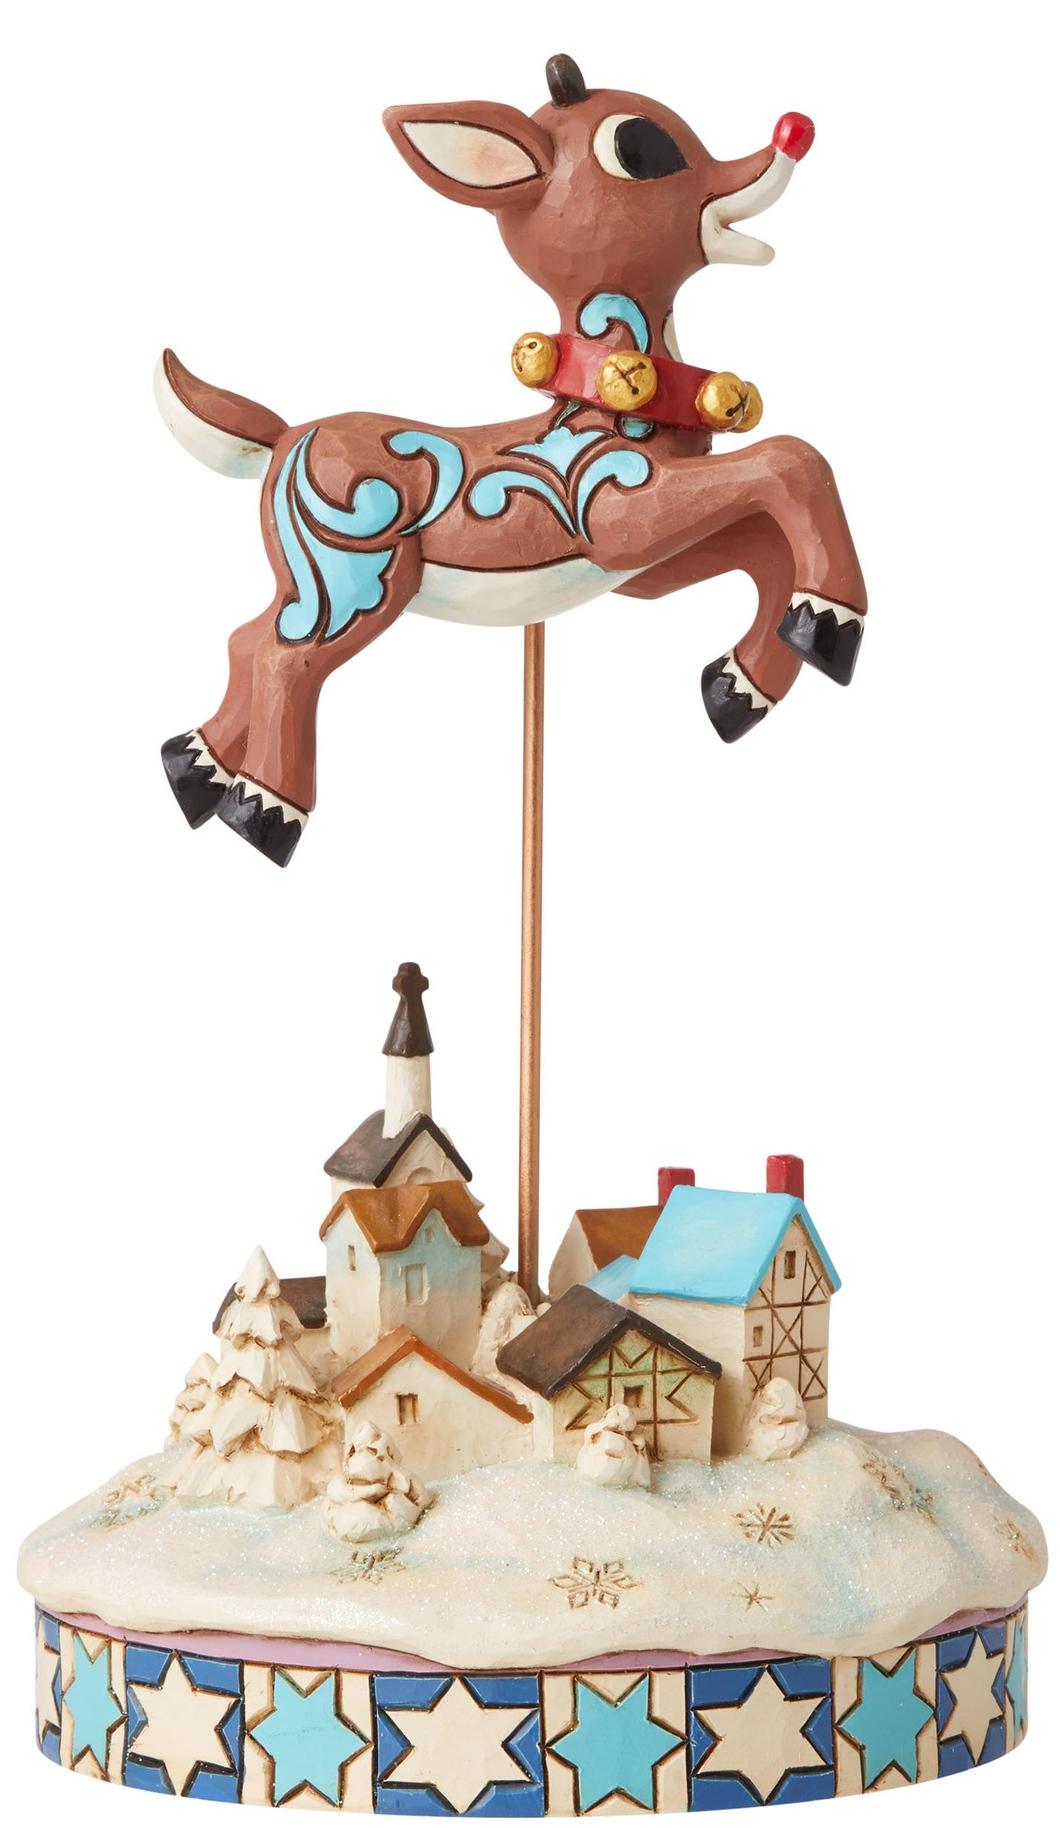 Jim Shore Rudolph Reindeer 6006792 Leaping Rudolph Figurine